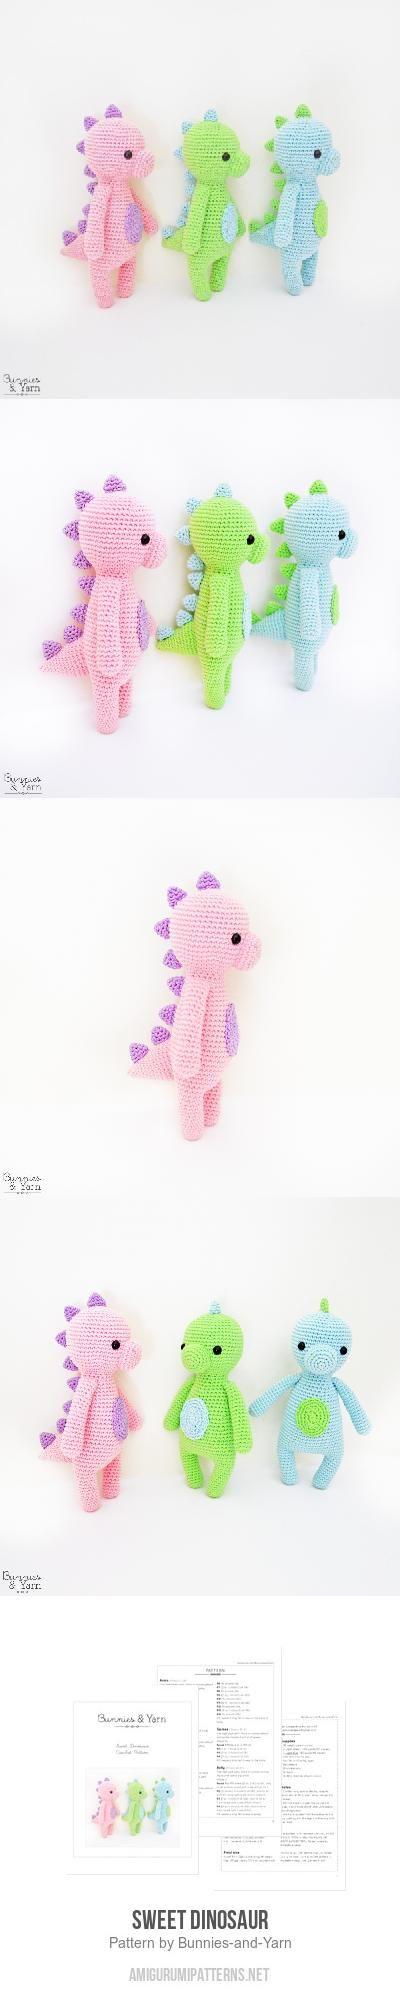 Sweet Dinosaur amigurumi pattern by Bunnies and Yarn | Tejido ...